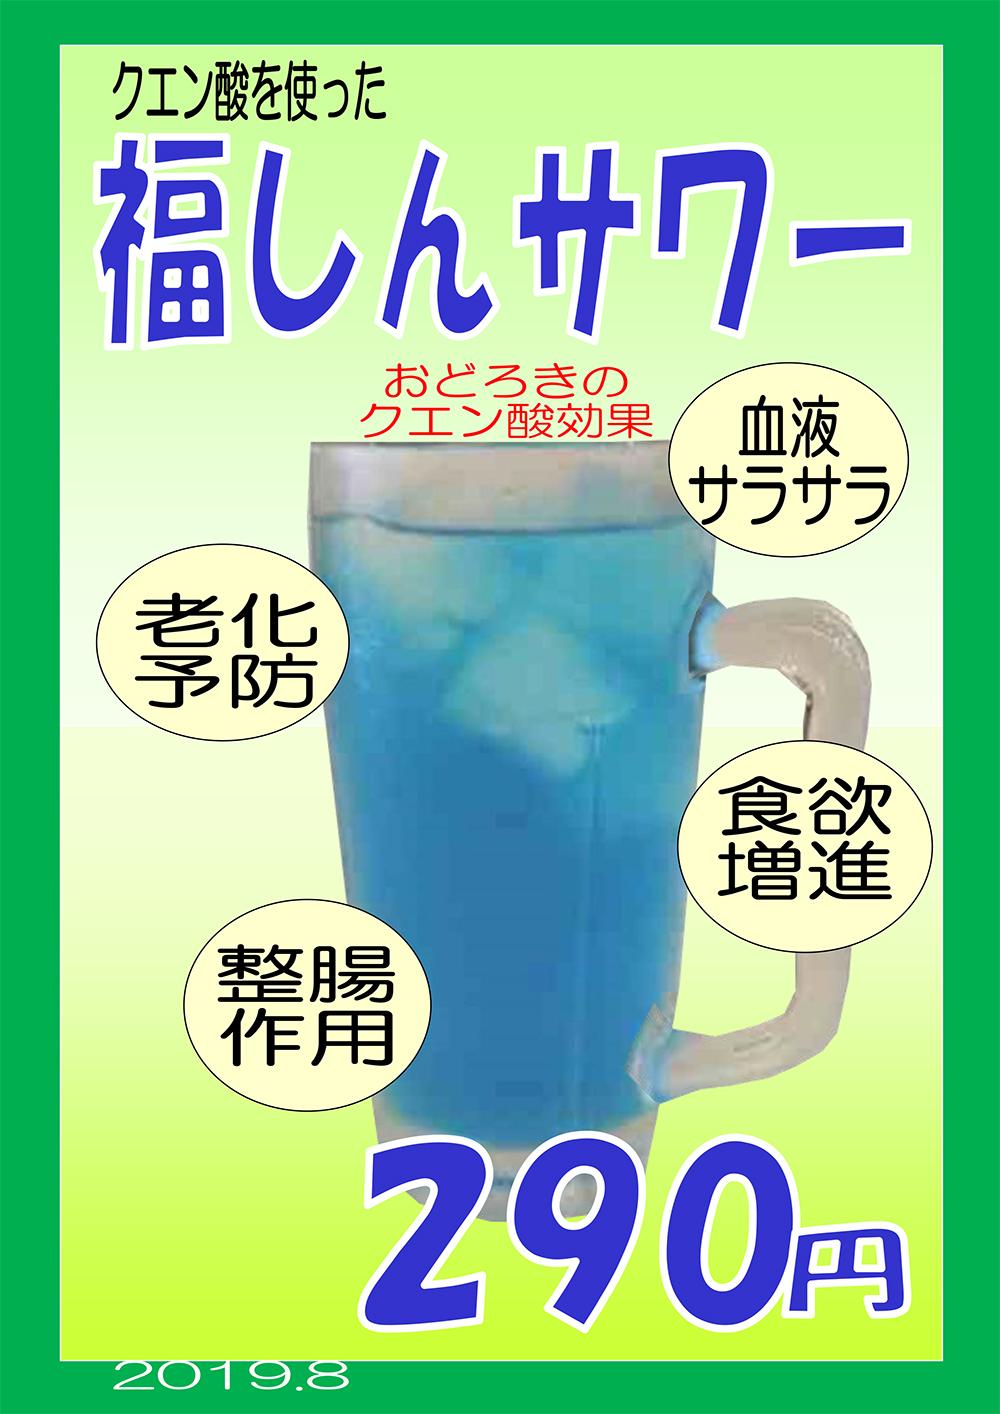 http://fuku-sin.co.jp/news/20190920_3.jpg